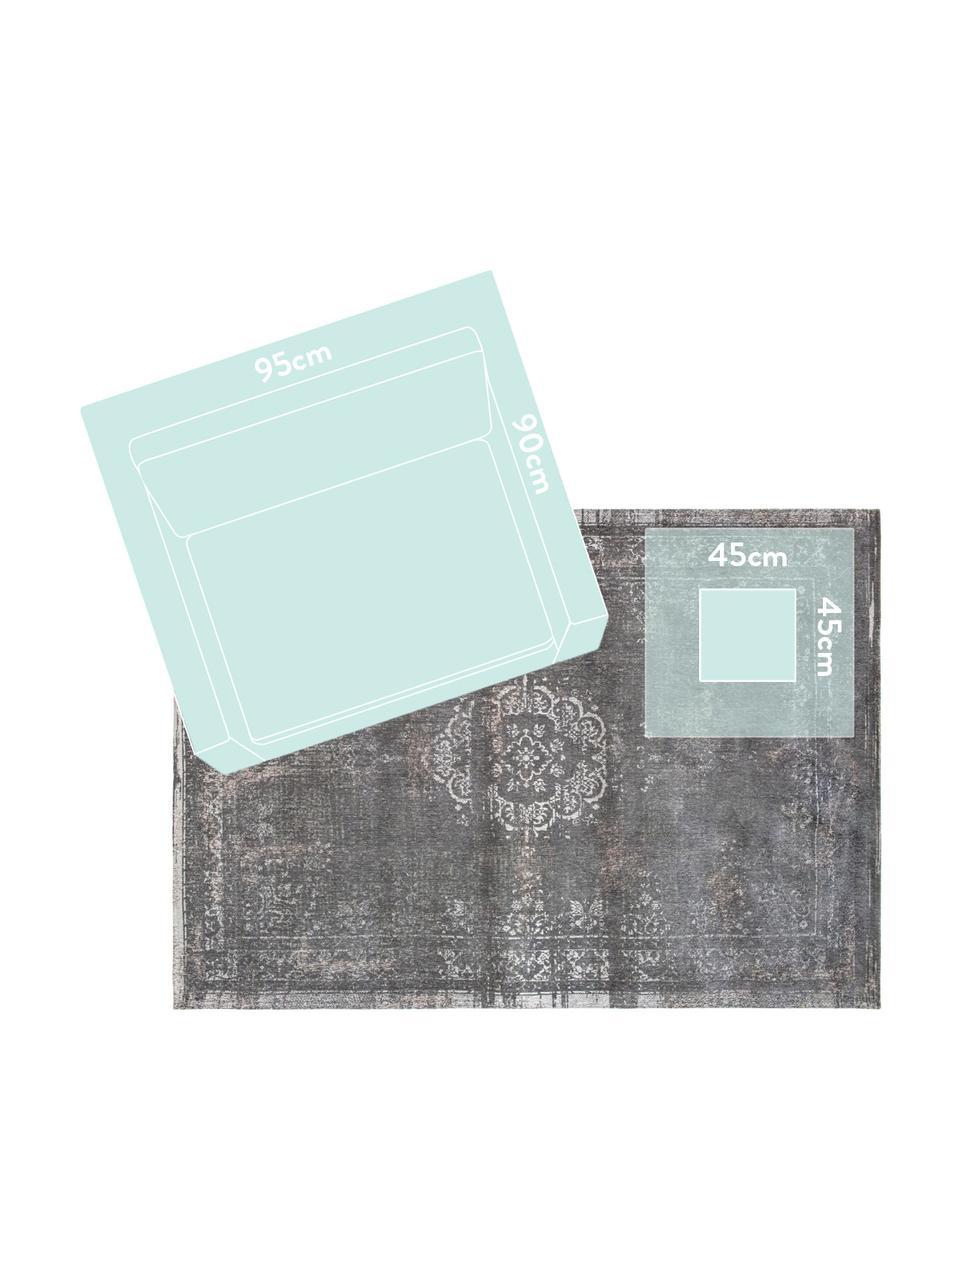 Vintage Chenilleteppich Medaillon in Grau/Beige, Webart: Jacquard, Grau, Beige, B 80 x L 150 cm (Größe XS)